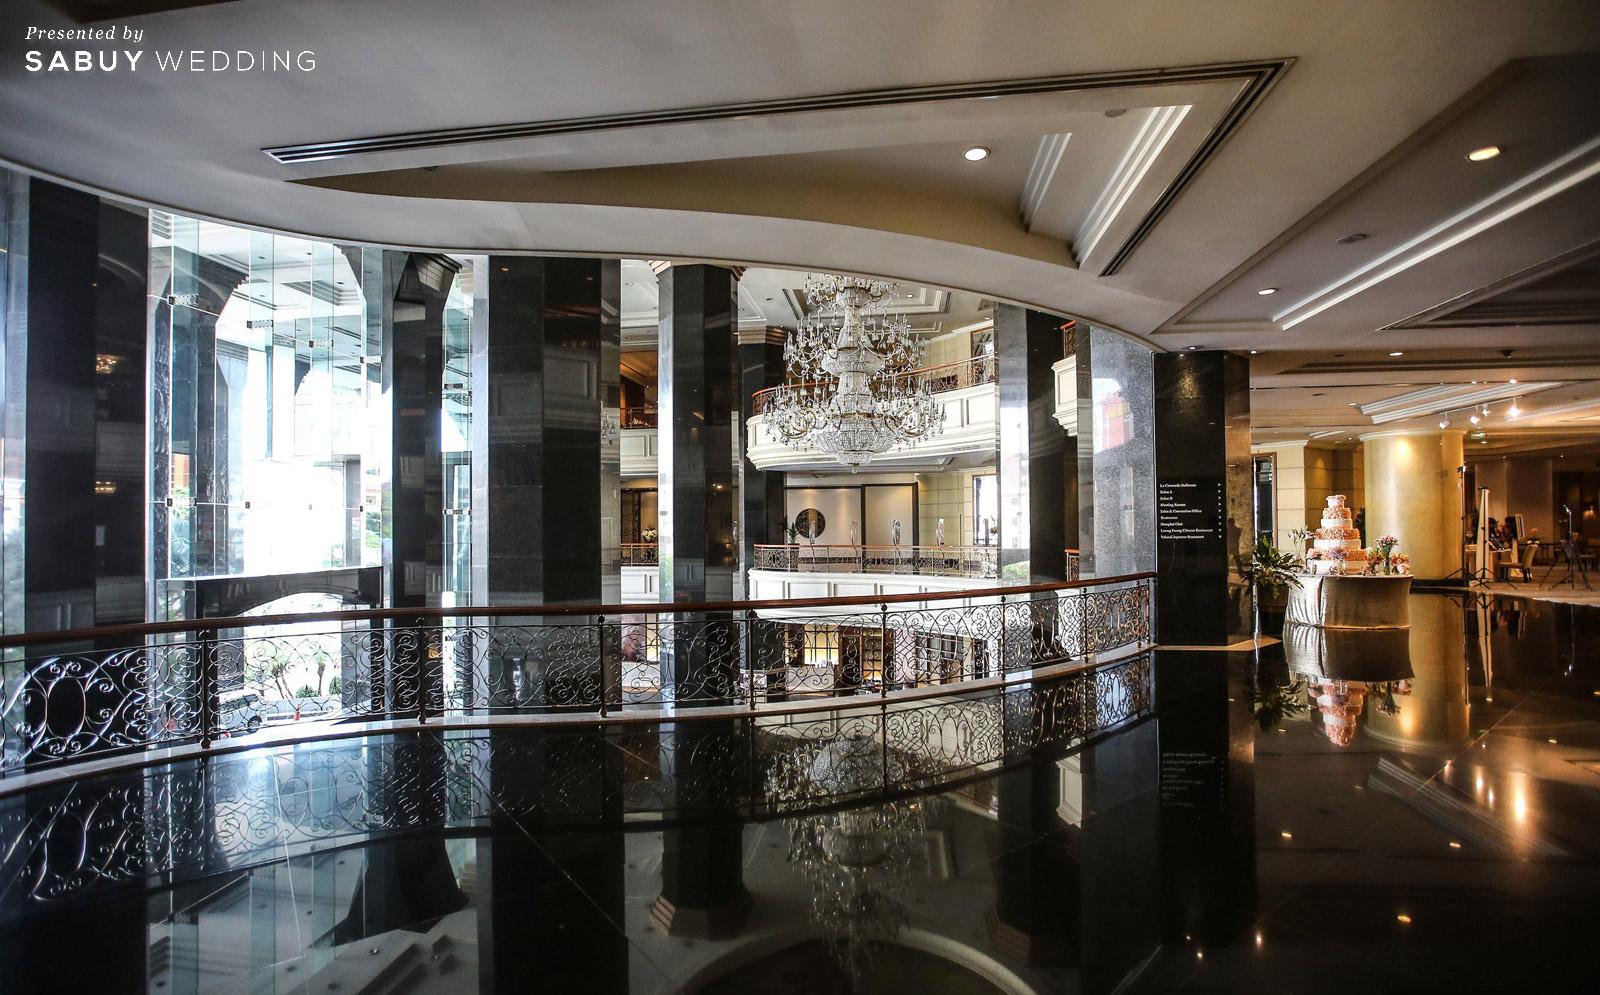 Swissotel Bangkok Ratchada,สถานที่แต่งงาน,สถานที่จัดงานแต่งงาน,โรงแรม Swissotel Bangkok Ratchada โรงแรมสุดหรูย่านห้วยขวาง ราคาย่อมเยา